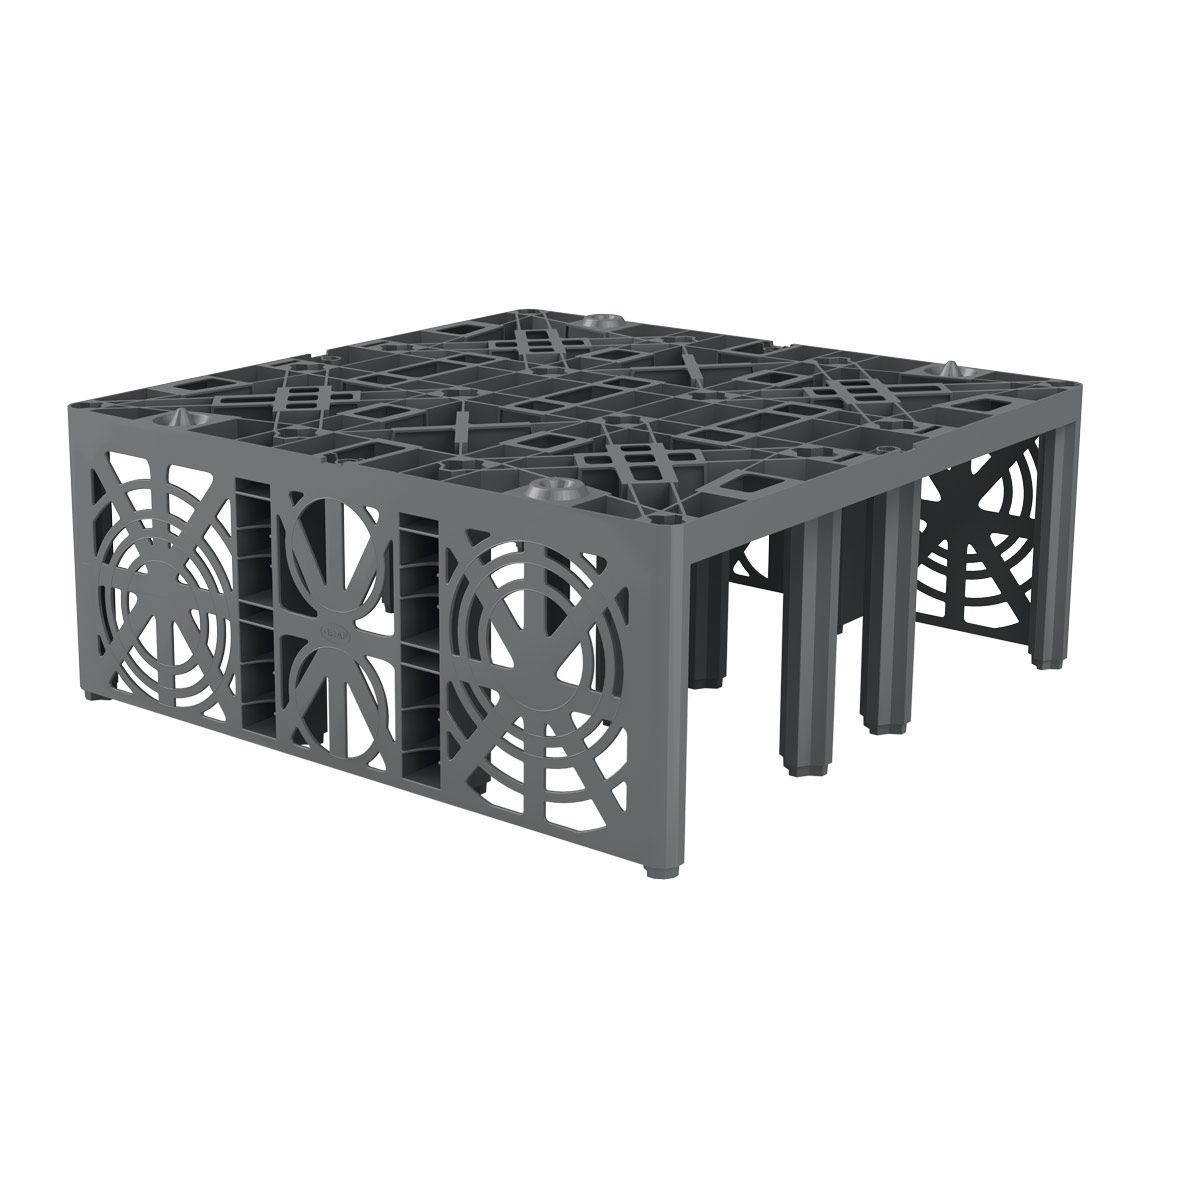 Rigole, EcoBloc Inspect flex, 800 x 800 x 320 mm